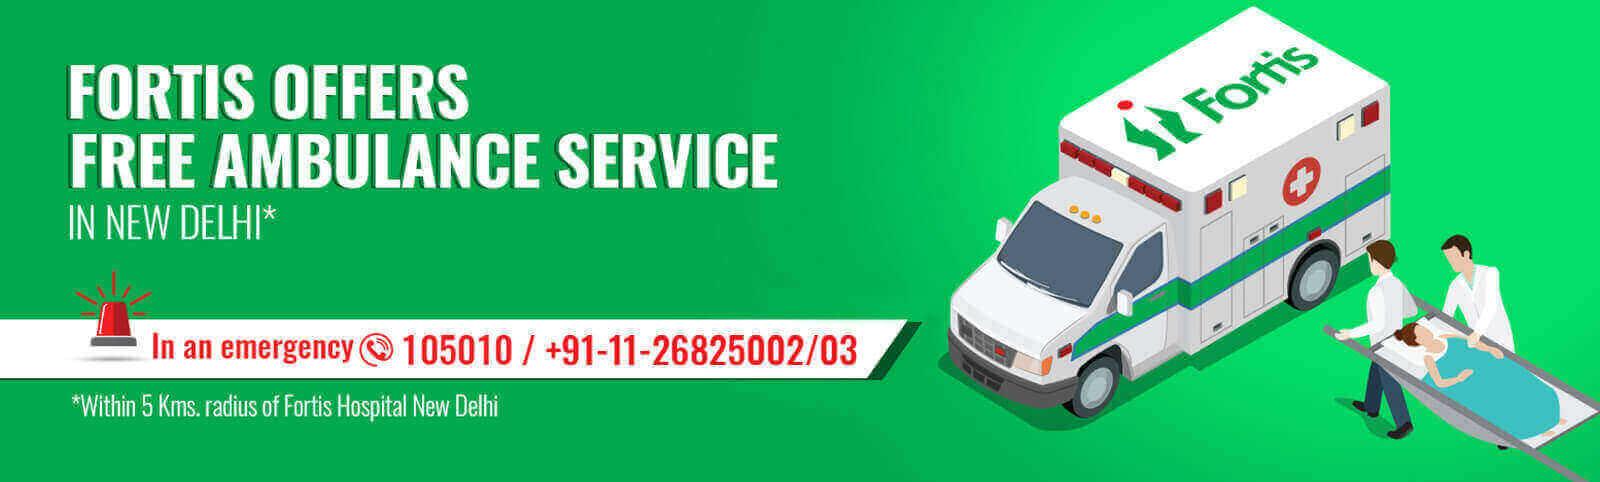 Fortis Escorts Ambulance free Service